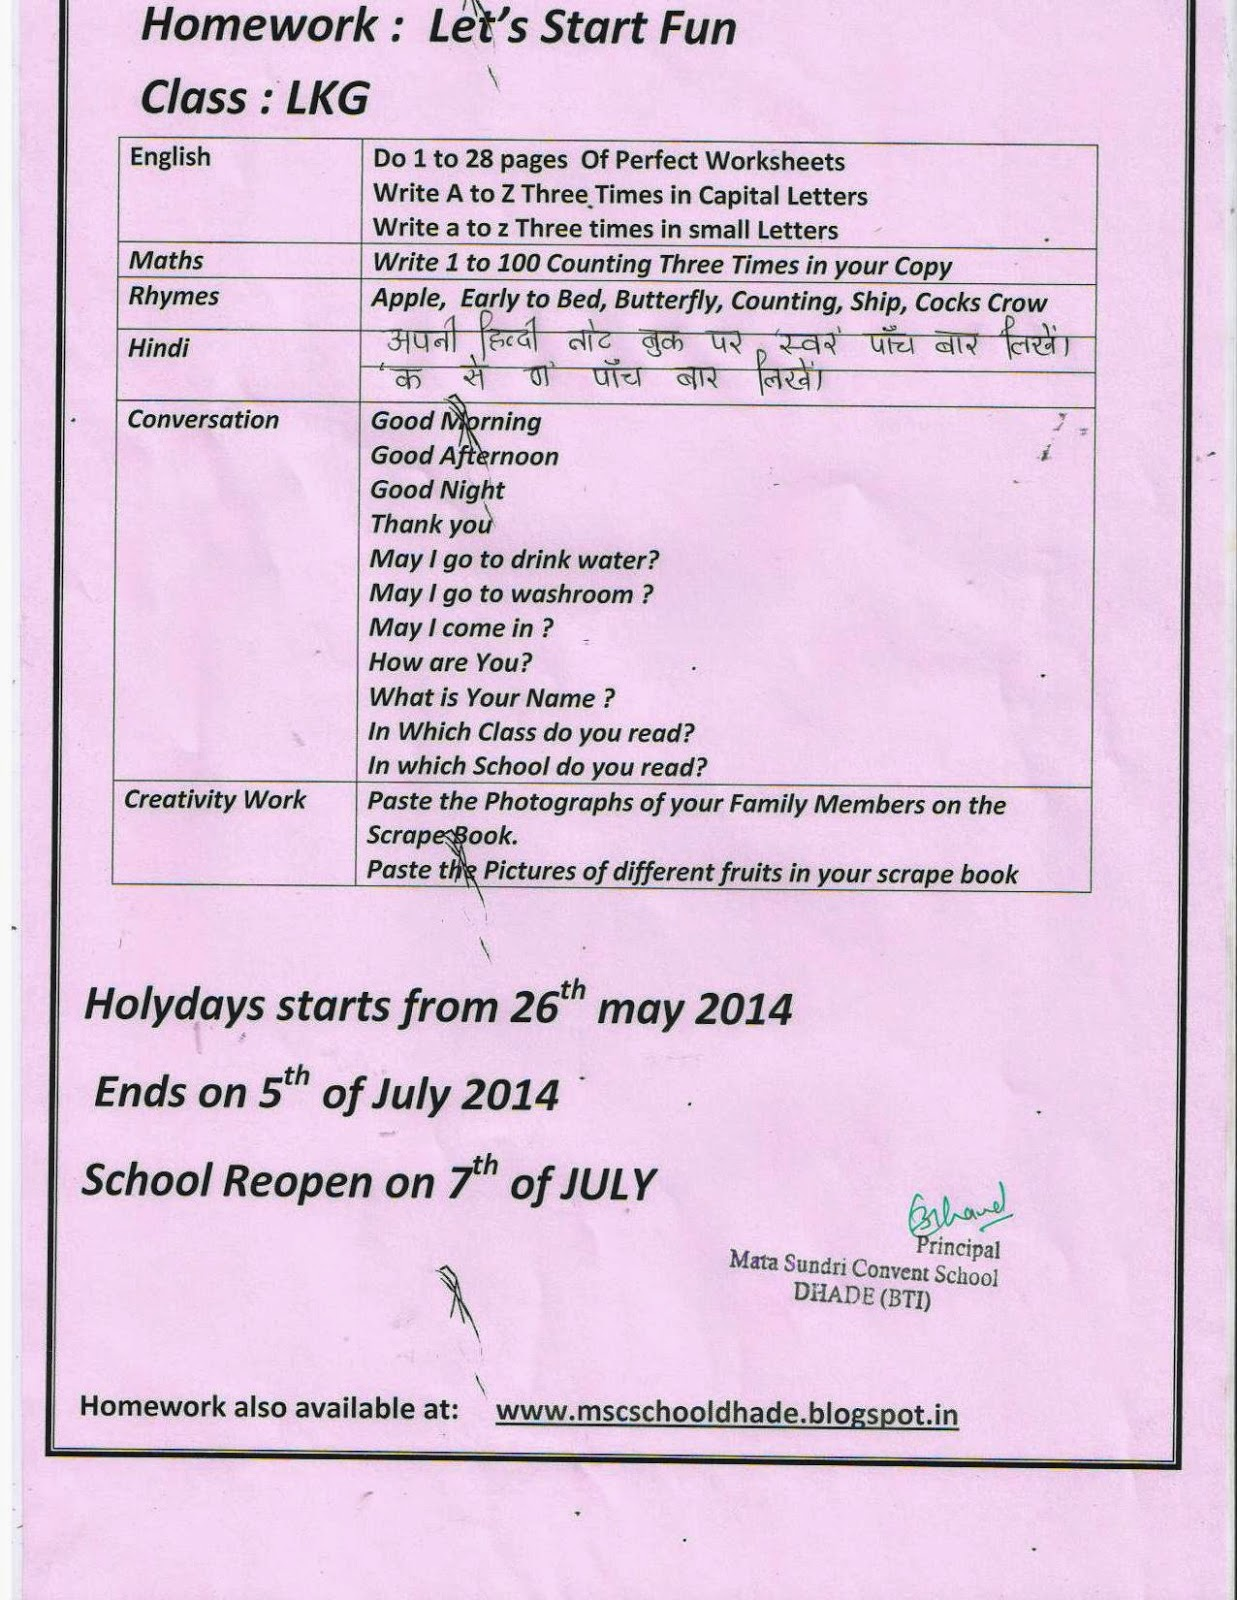 Mata Sundri Convent School Holiday S Homework For Ukg Class